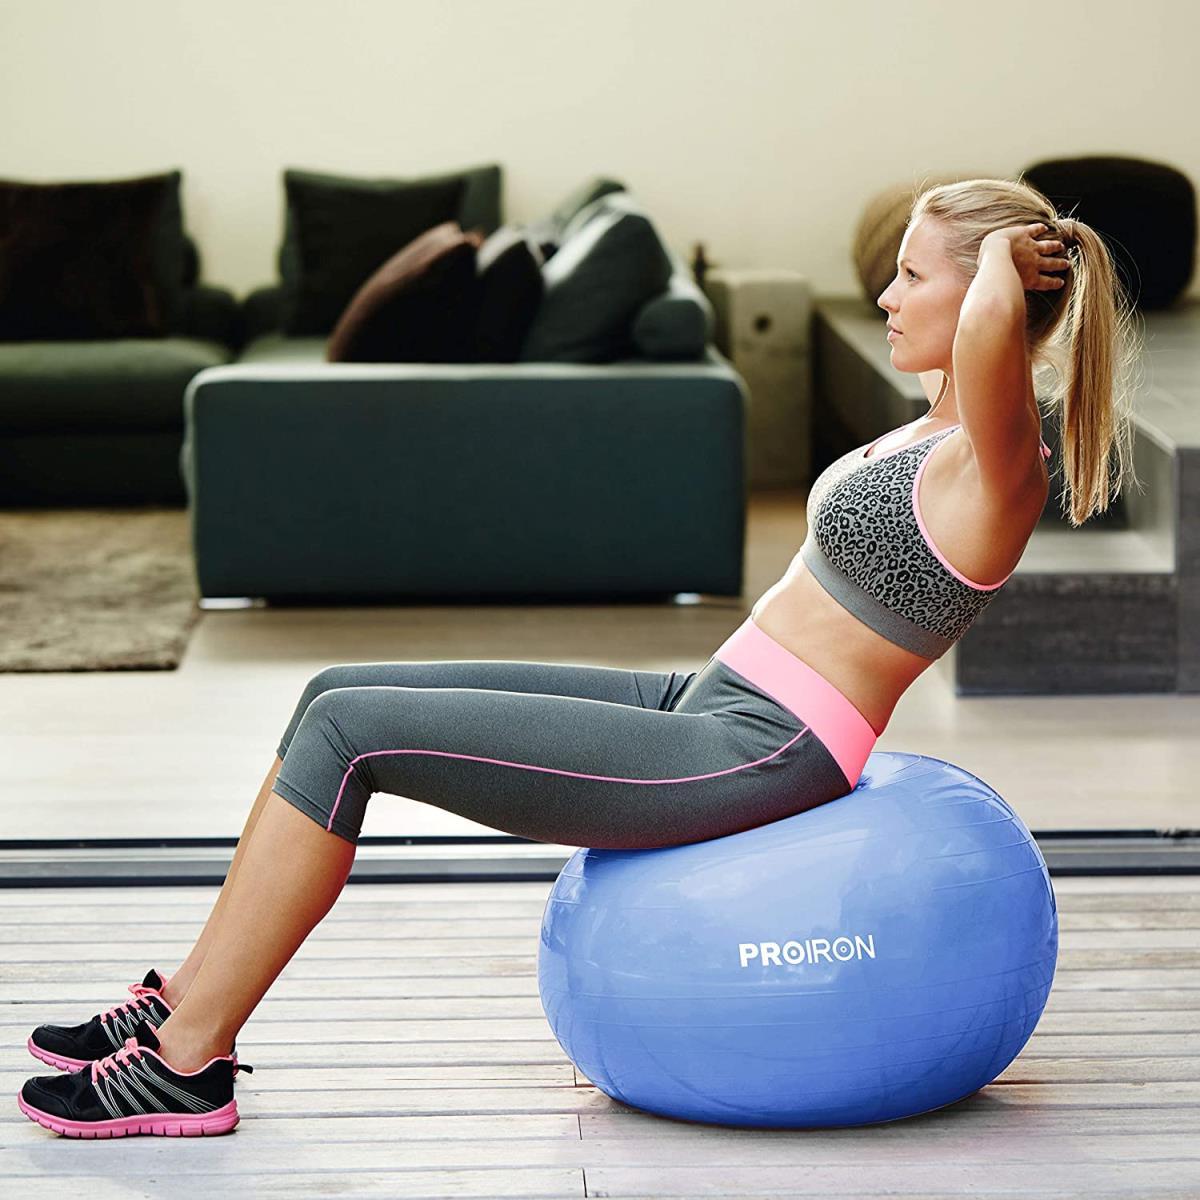 PROIRON Gymnastikball Ø65cm mit Pumpe Übung Yoga Balance Ball Pezziball Sitzball,PROIRON,PRO-YJ01-4, 6942590000296